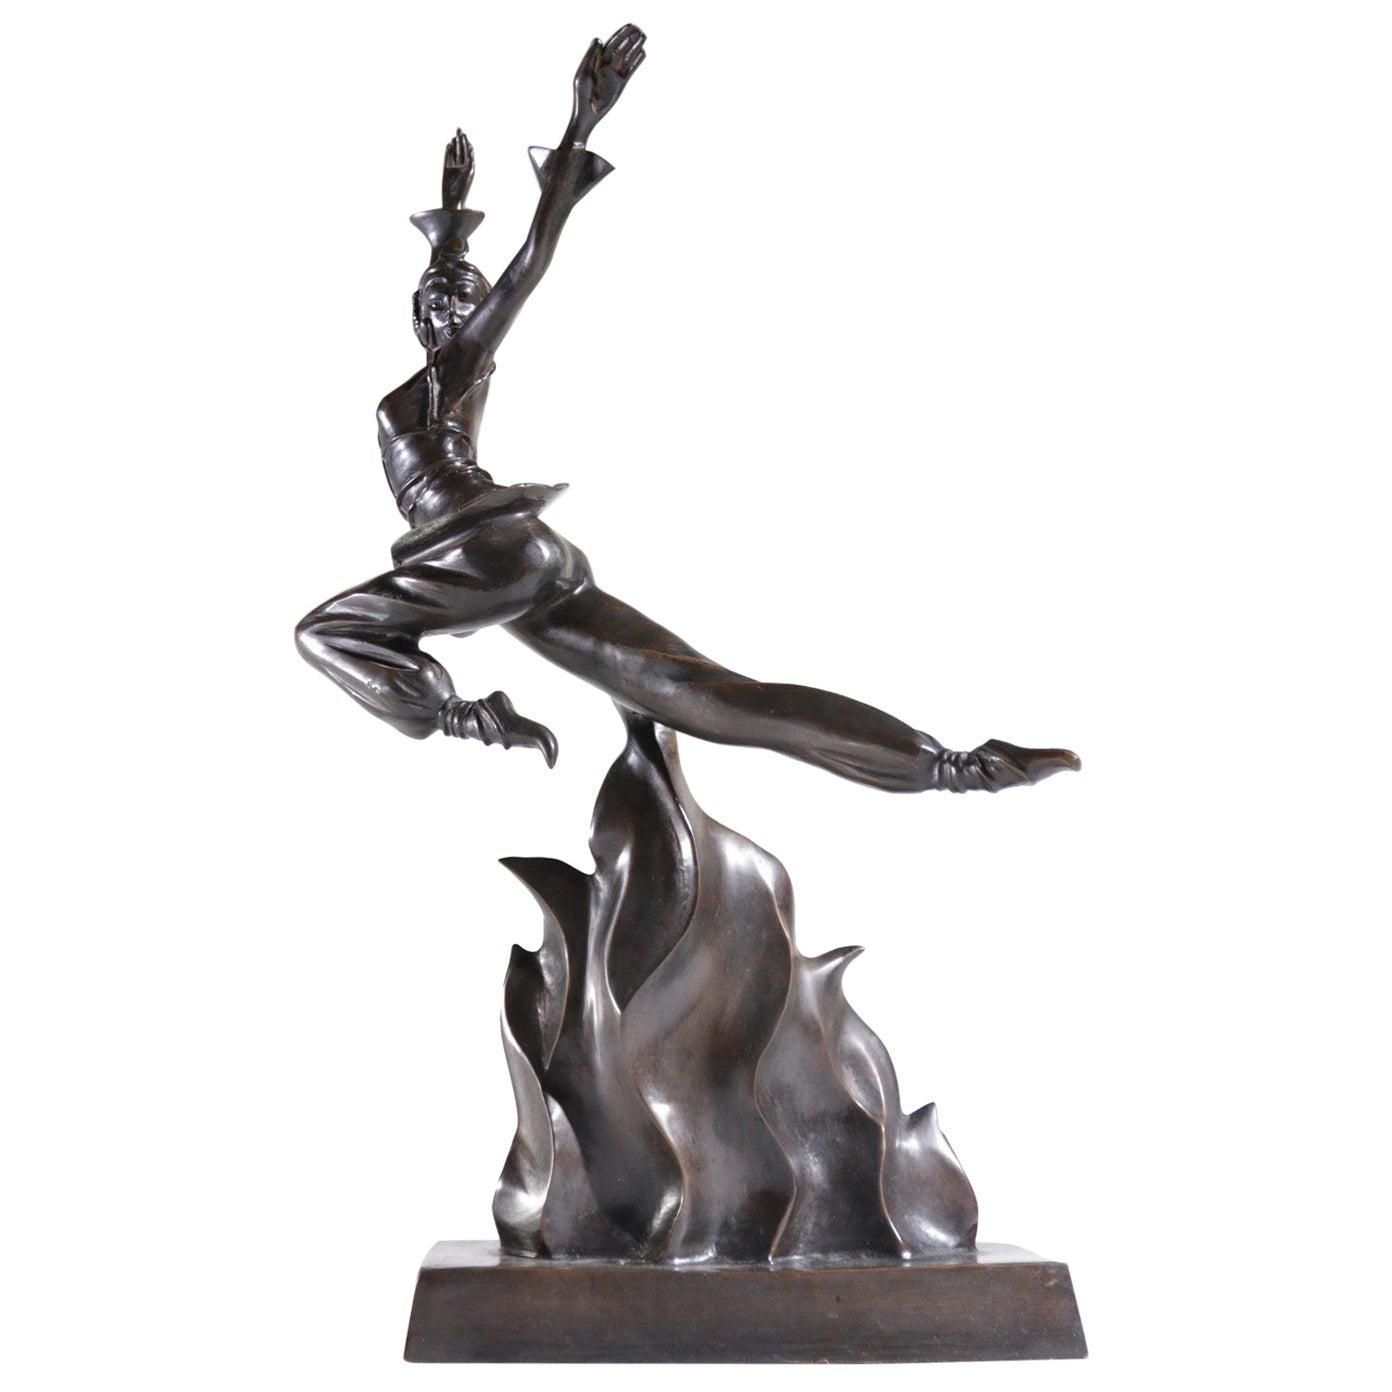 Powerful Art Deco Bronze Sculpture of a Woman, J. Moigniez, circa 1930